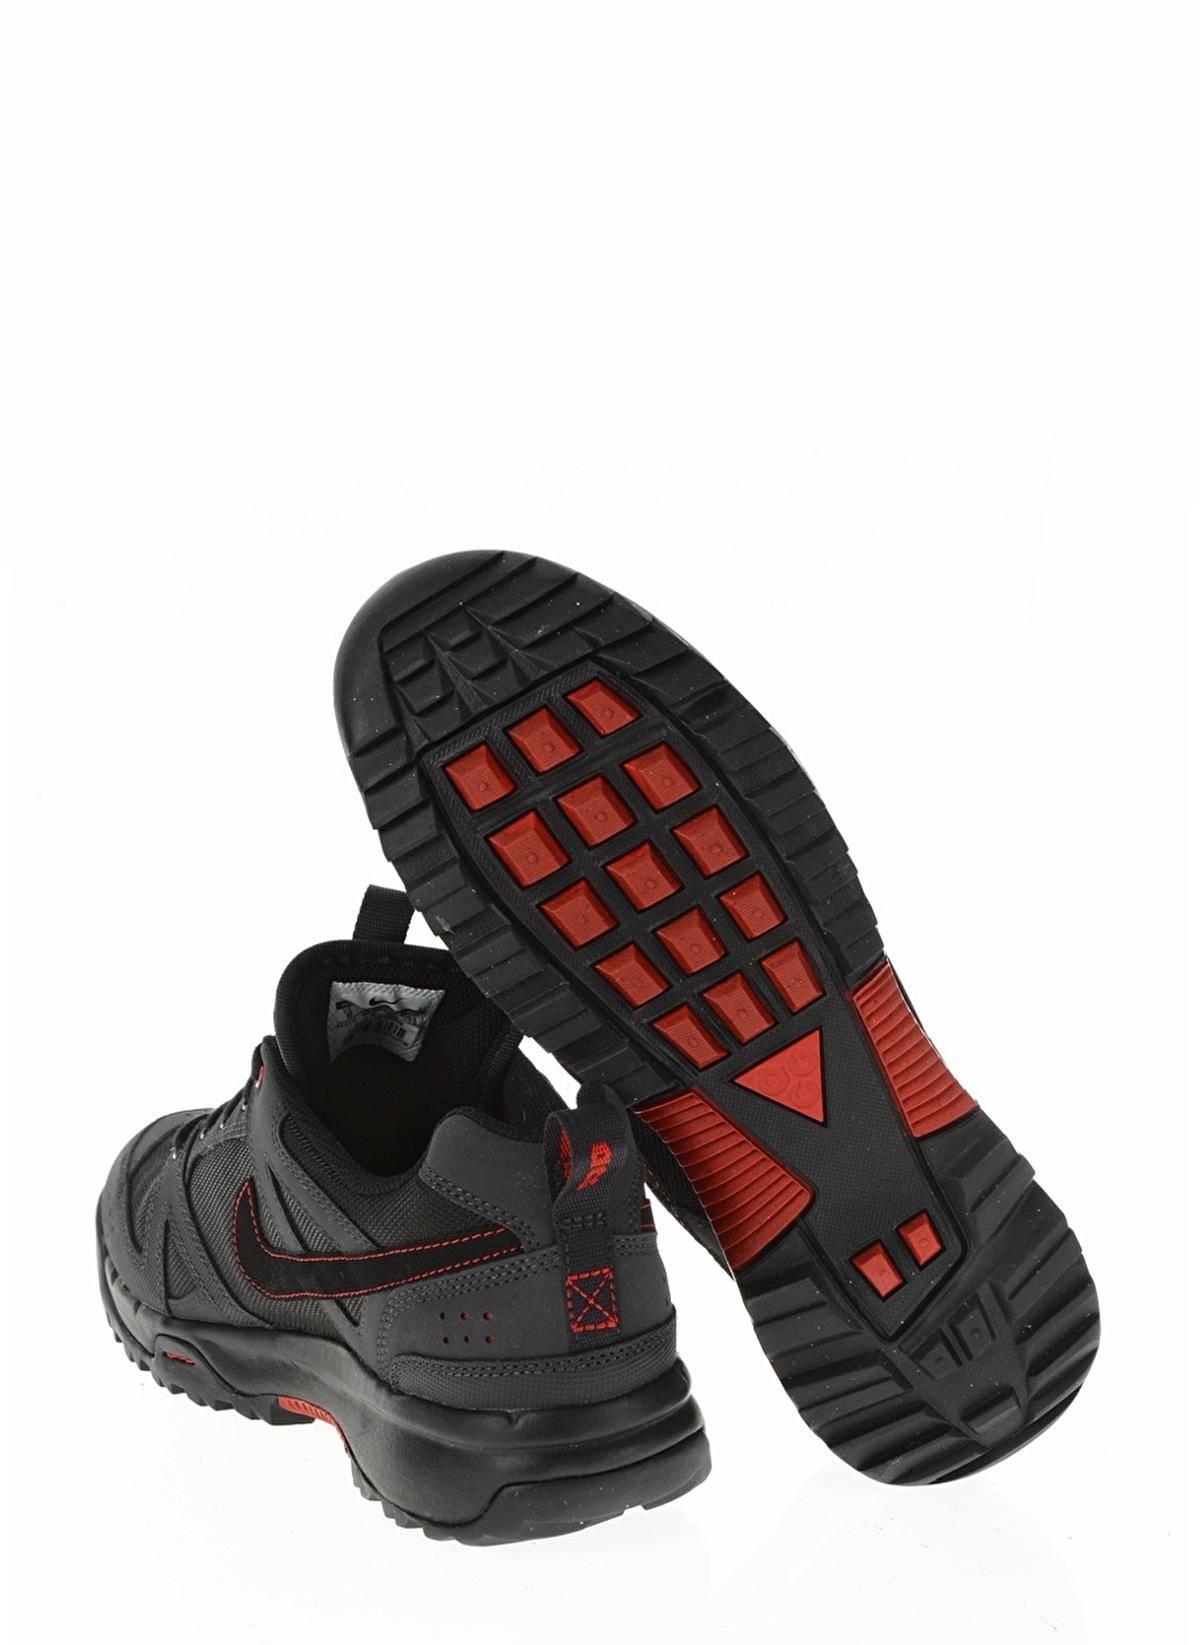 a8150d4966c Nike erkek rongbuk dark charcoal black red morhipo jpg 1199x1645 Nike  rongbuk